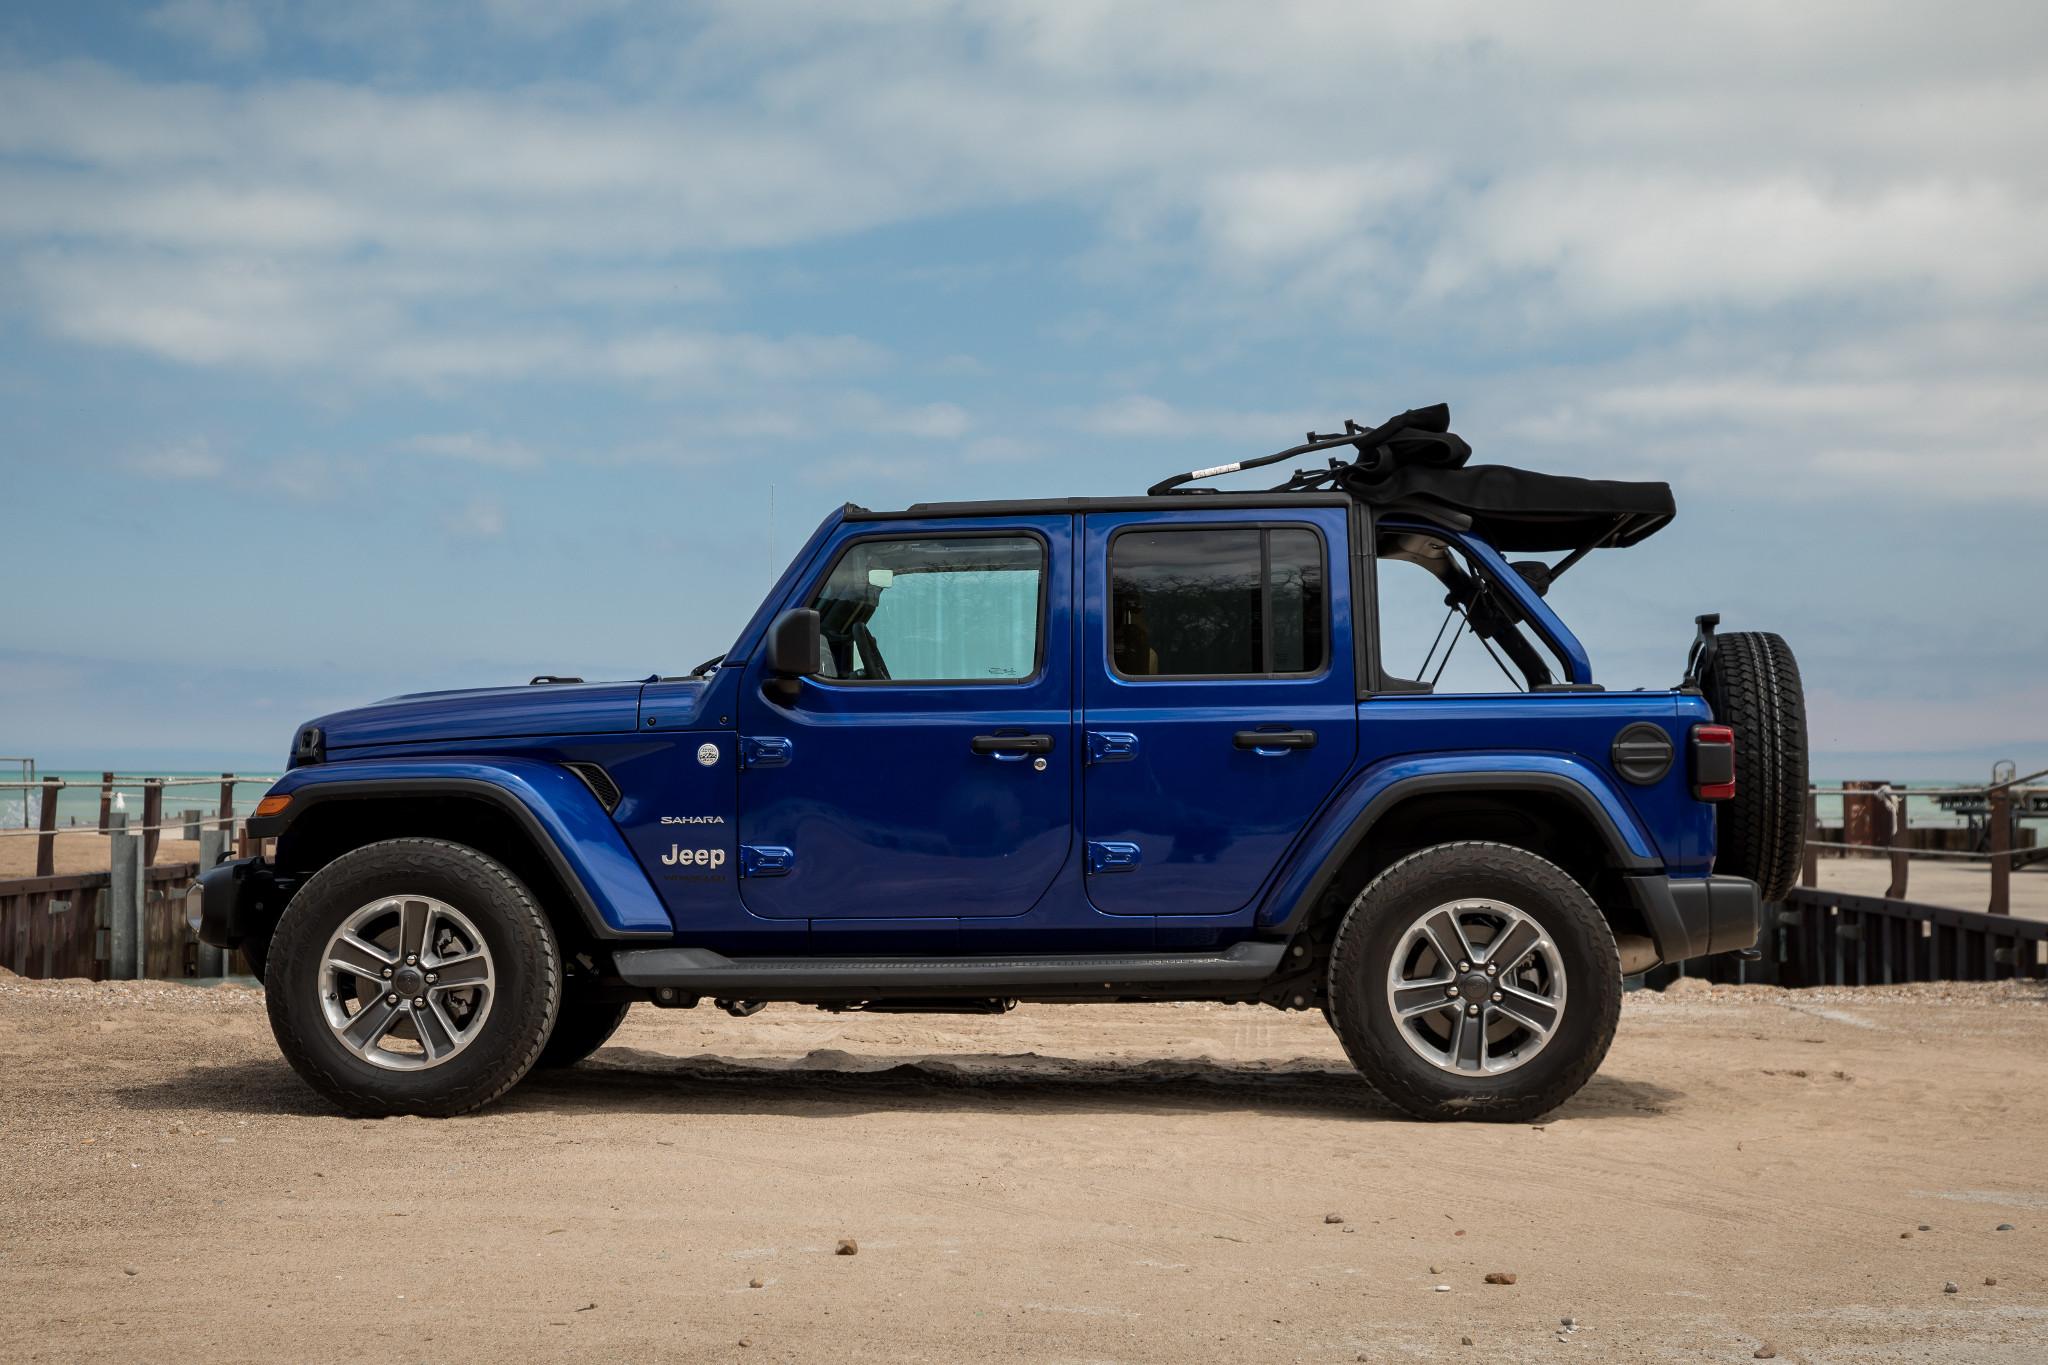 03-jeep-wrangler-2019-beach--blue--exterior--profile.jpg